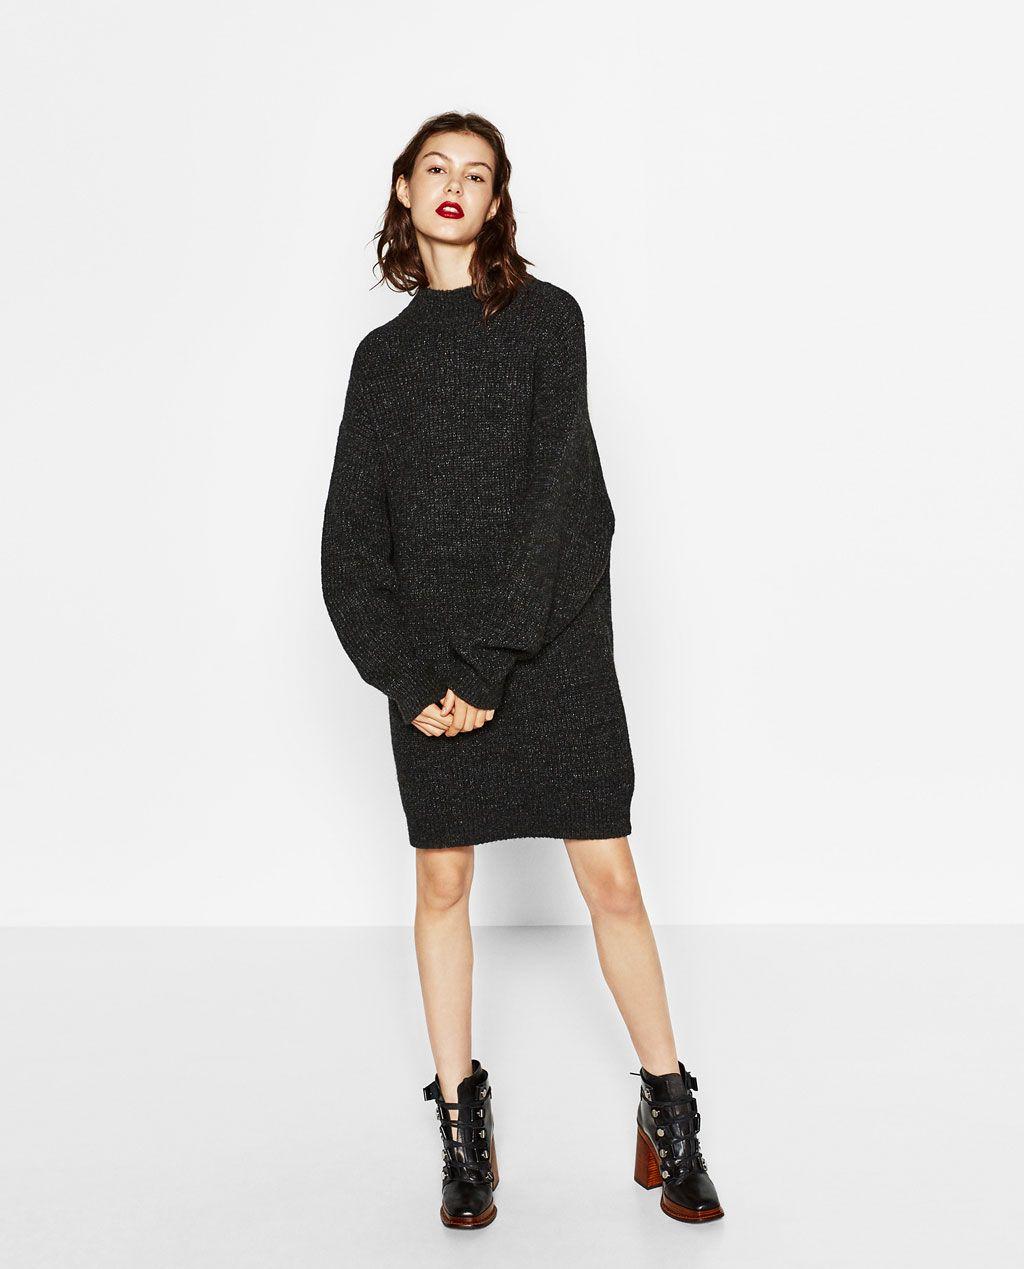 – 2018 Soirée Chasuble De Robes Élégantes Femme Robe Zara vOmwN8n0yP